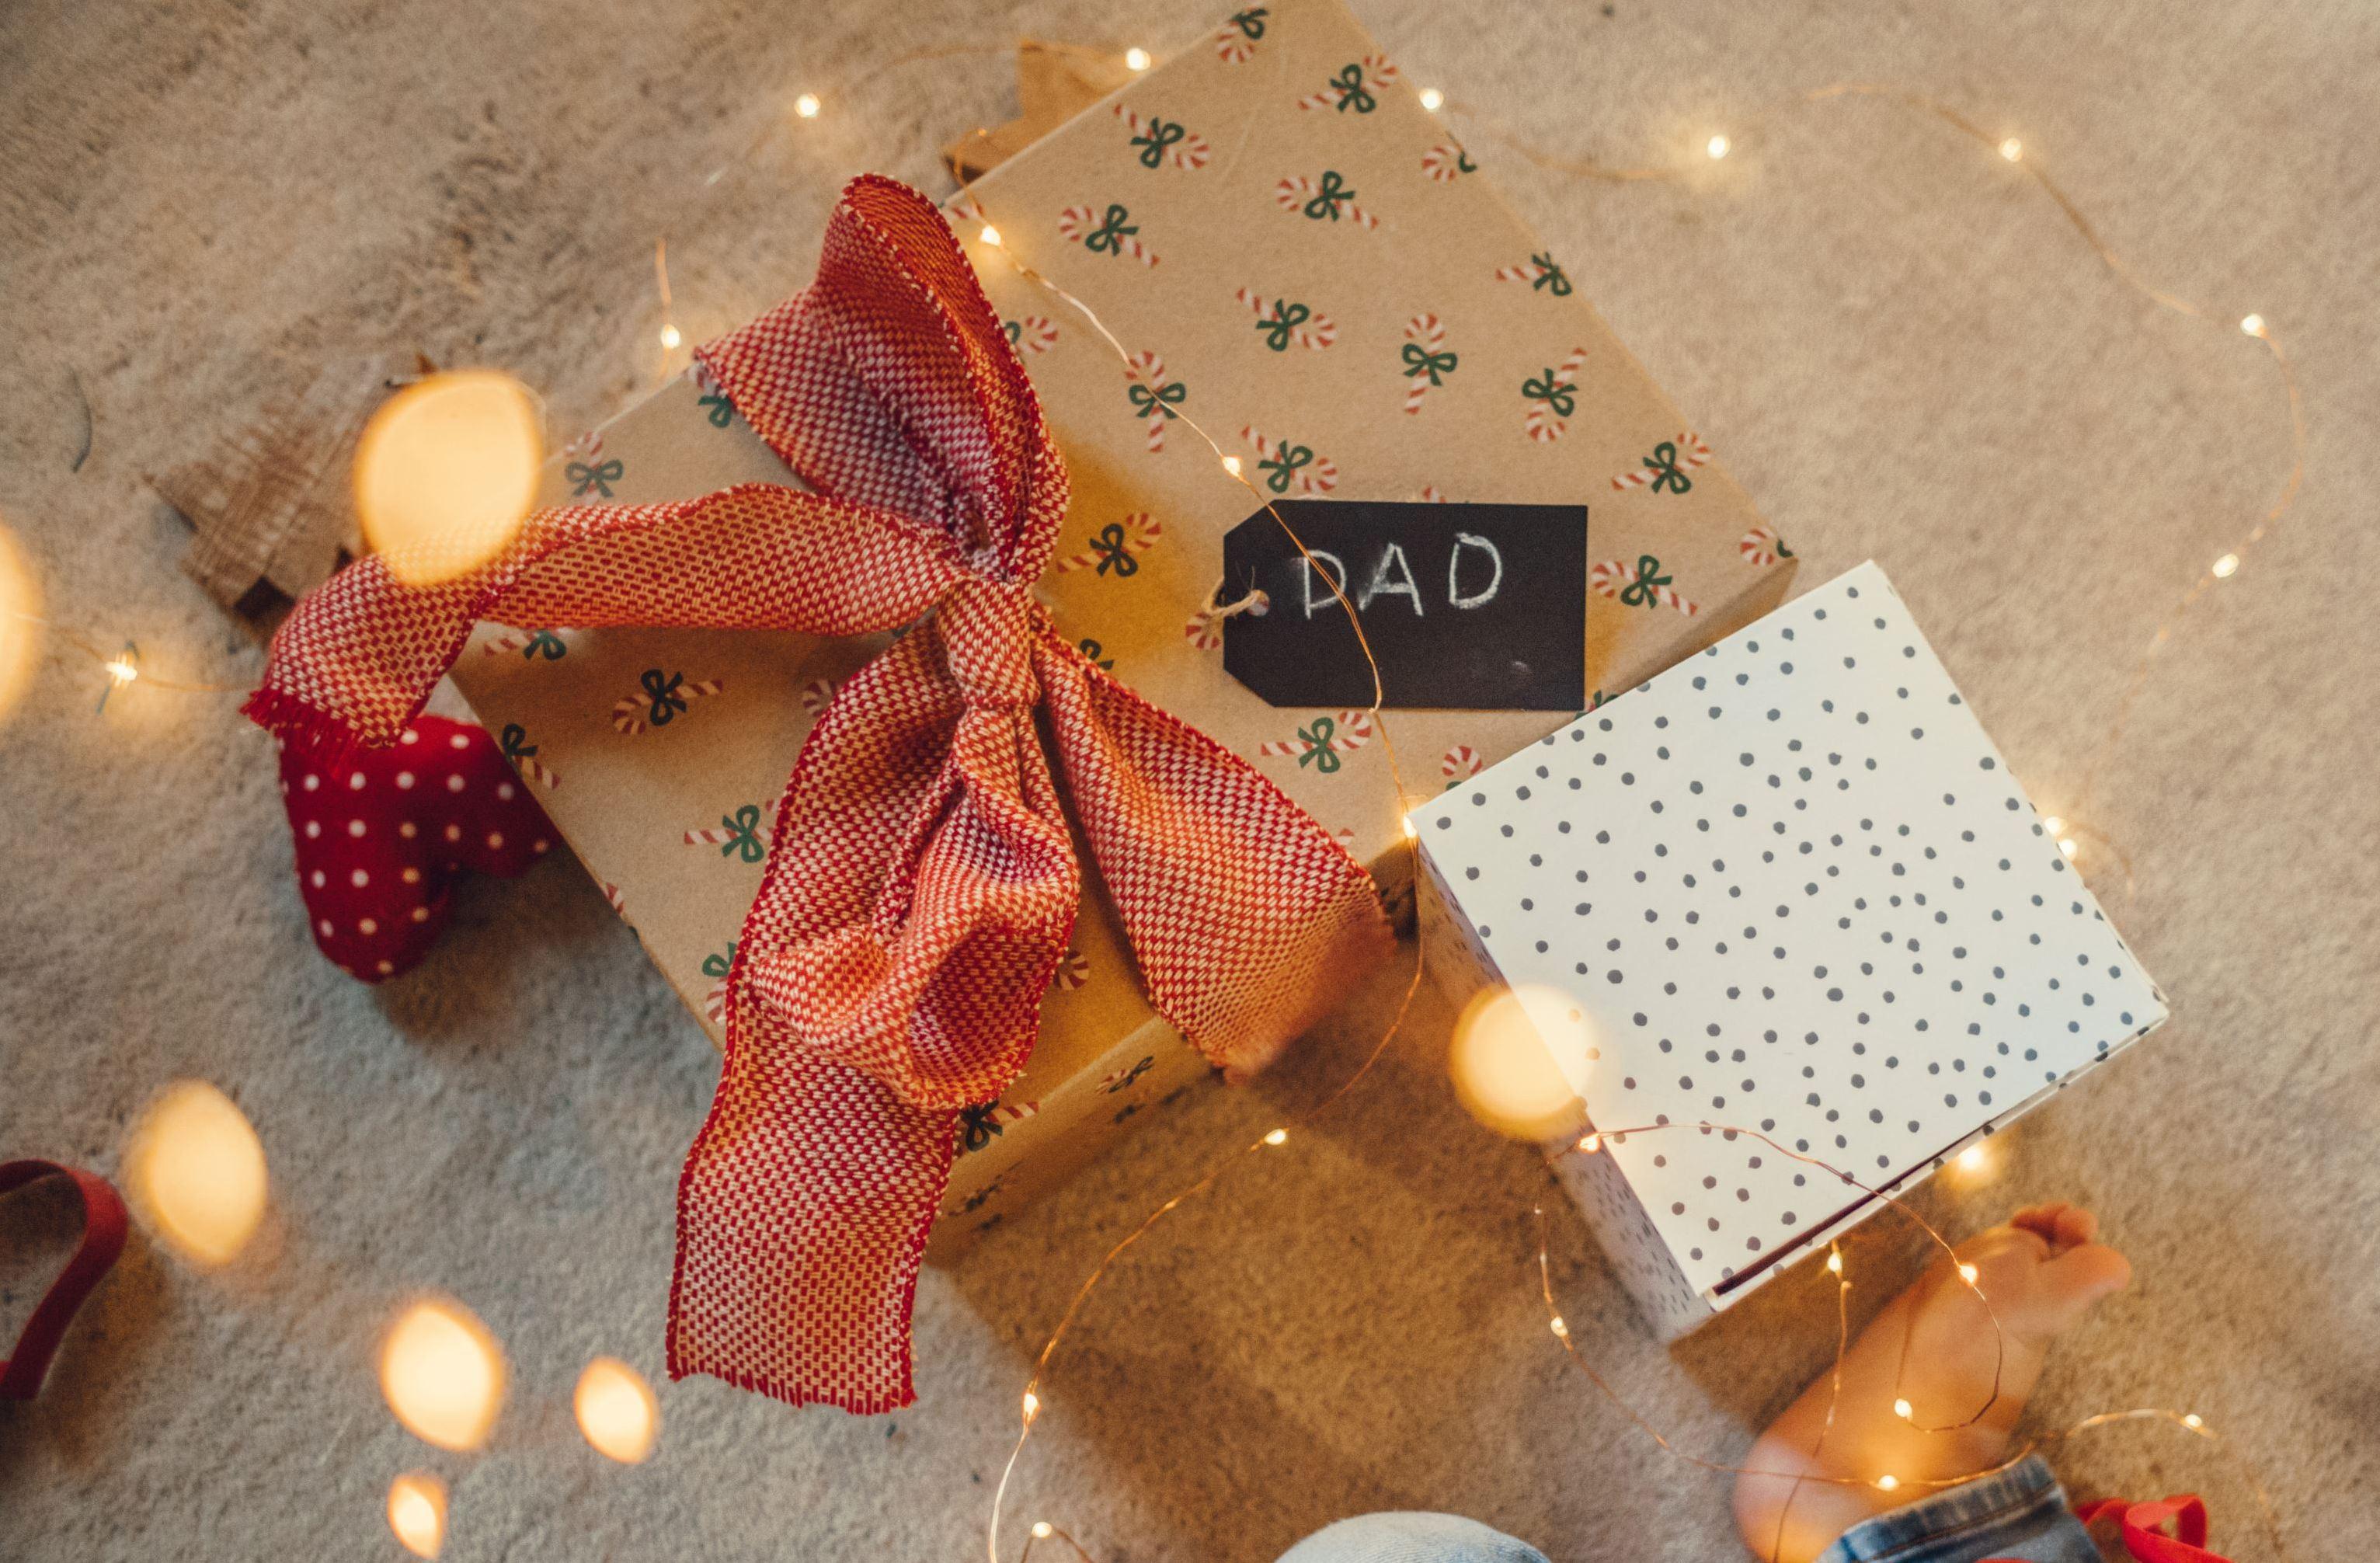 10 ideias de prendas de Natal para o pai que podes encontrar na FNAC